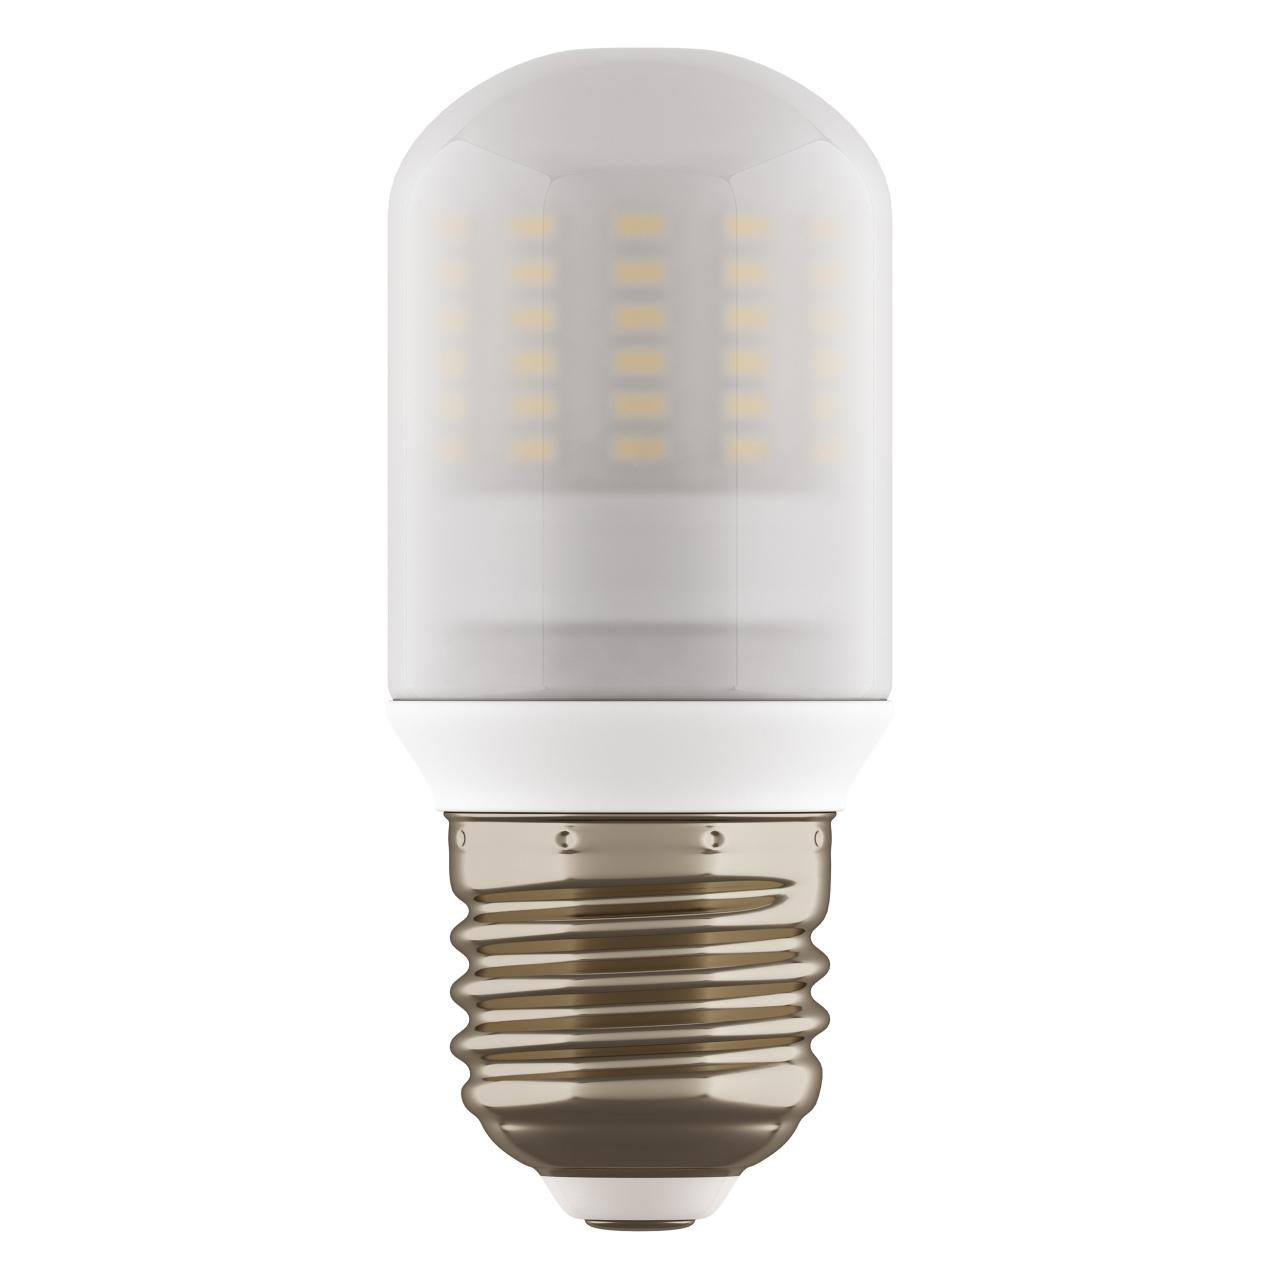 Лампа LED 220V T35 E27 9W=90W 770LM 360G FR 3000K 20000H Lightstar 930912